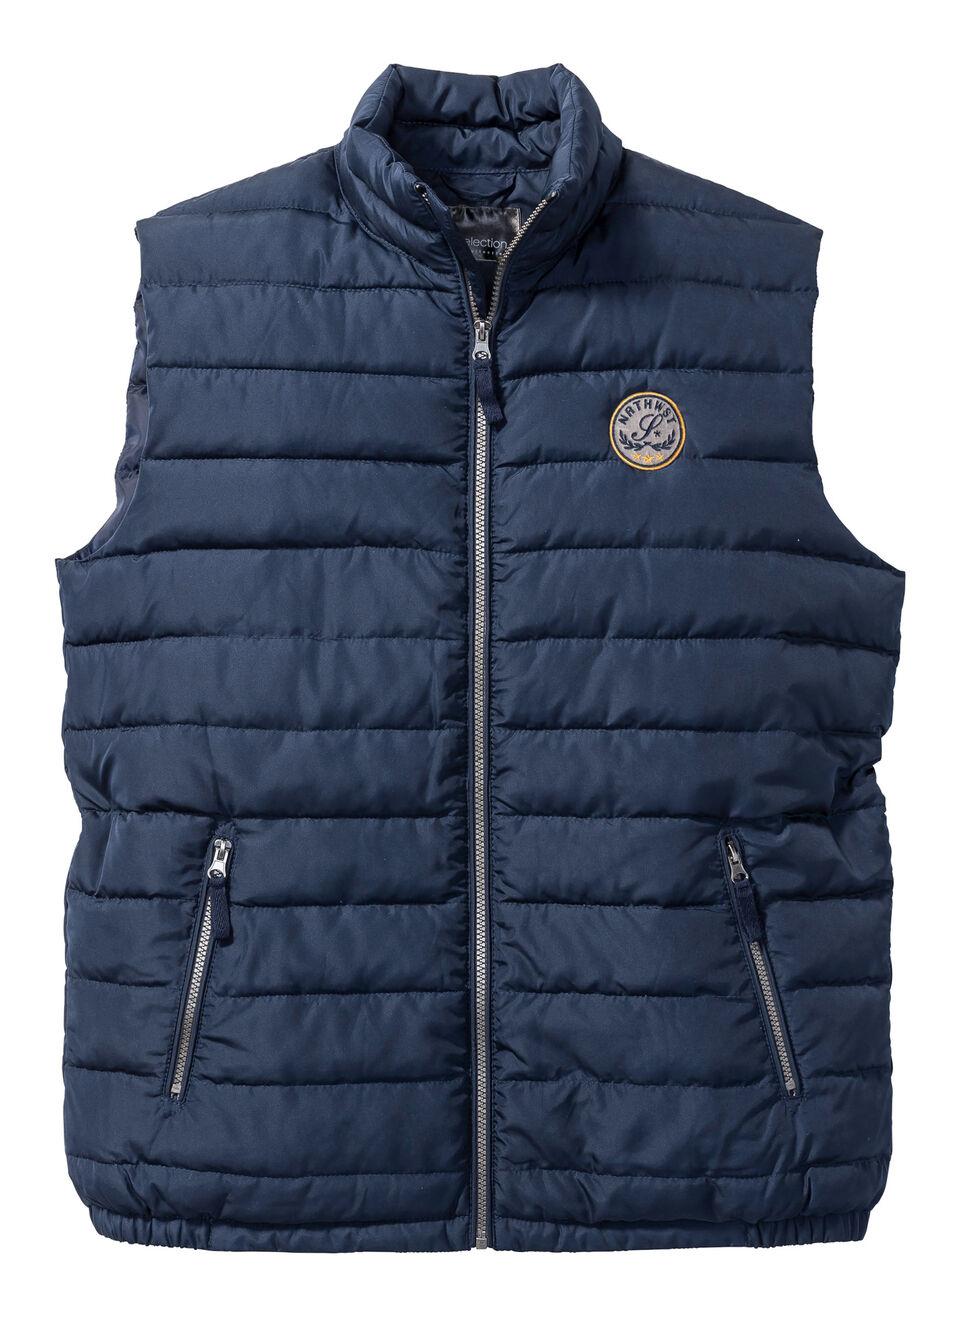 Prešívaná vesta bonprix